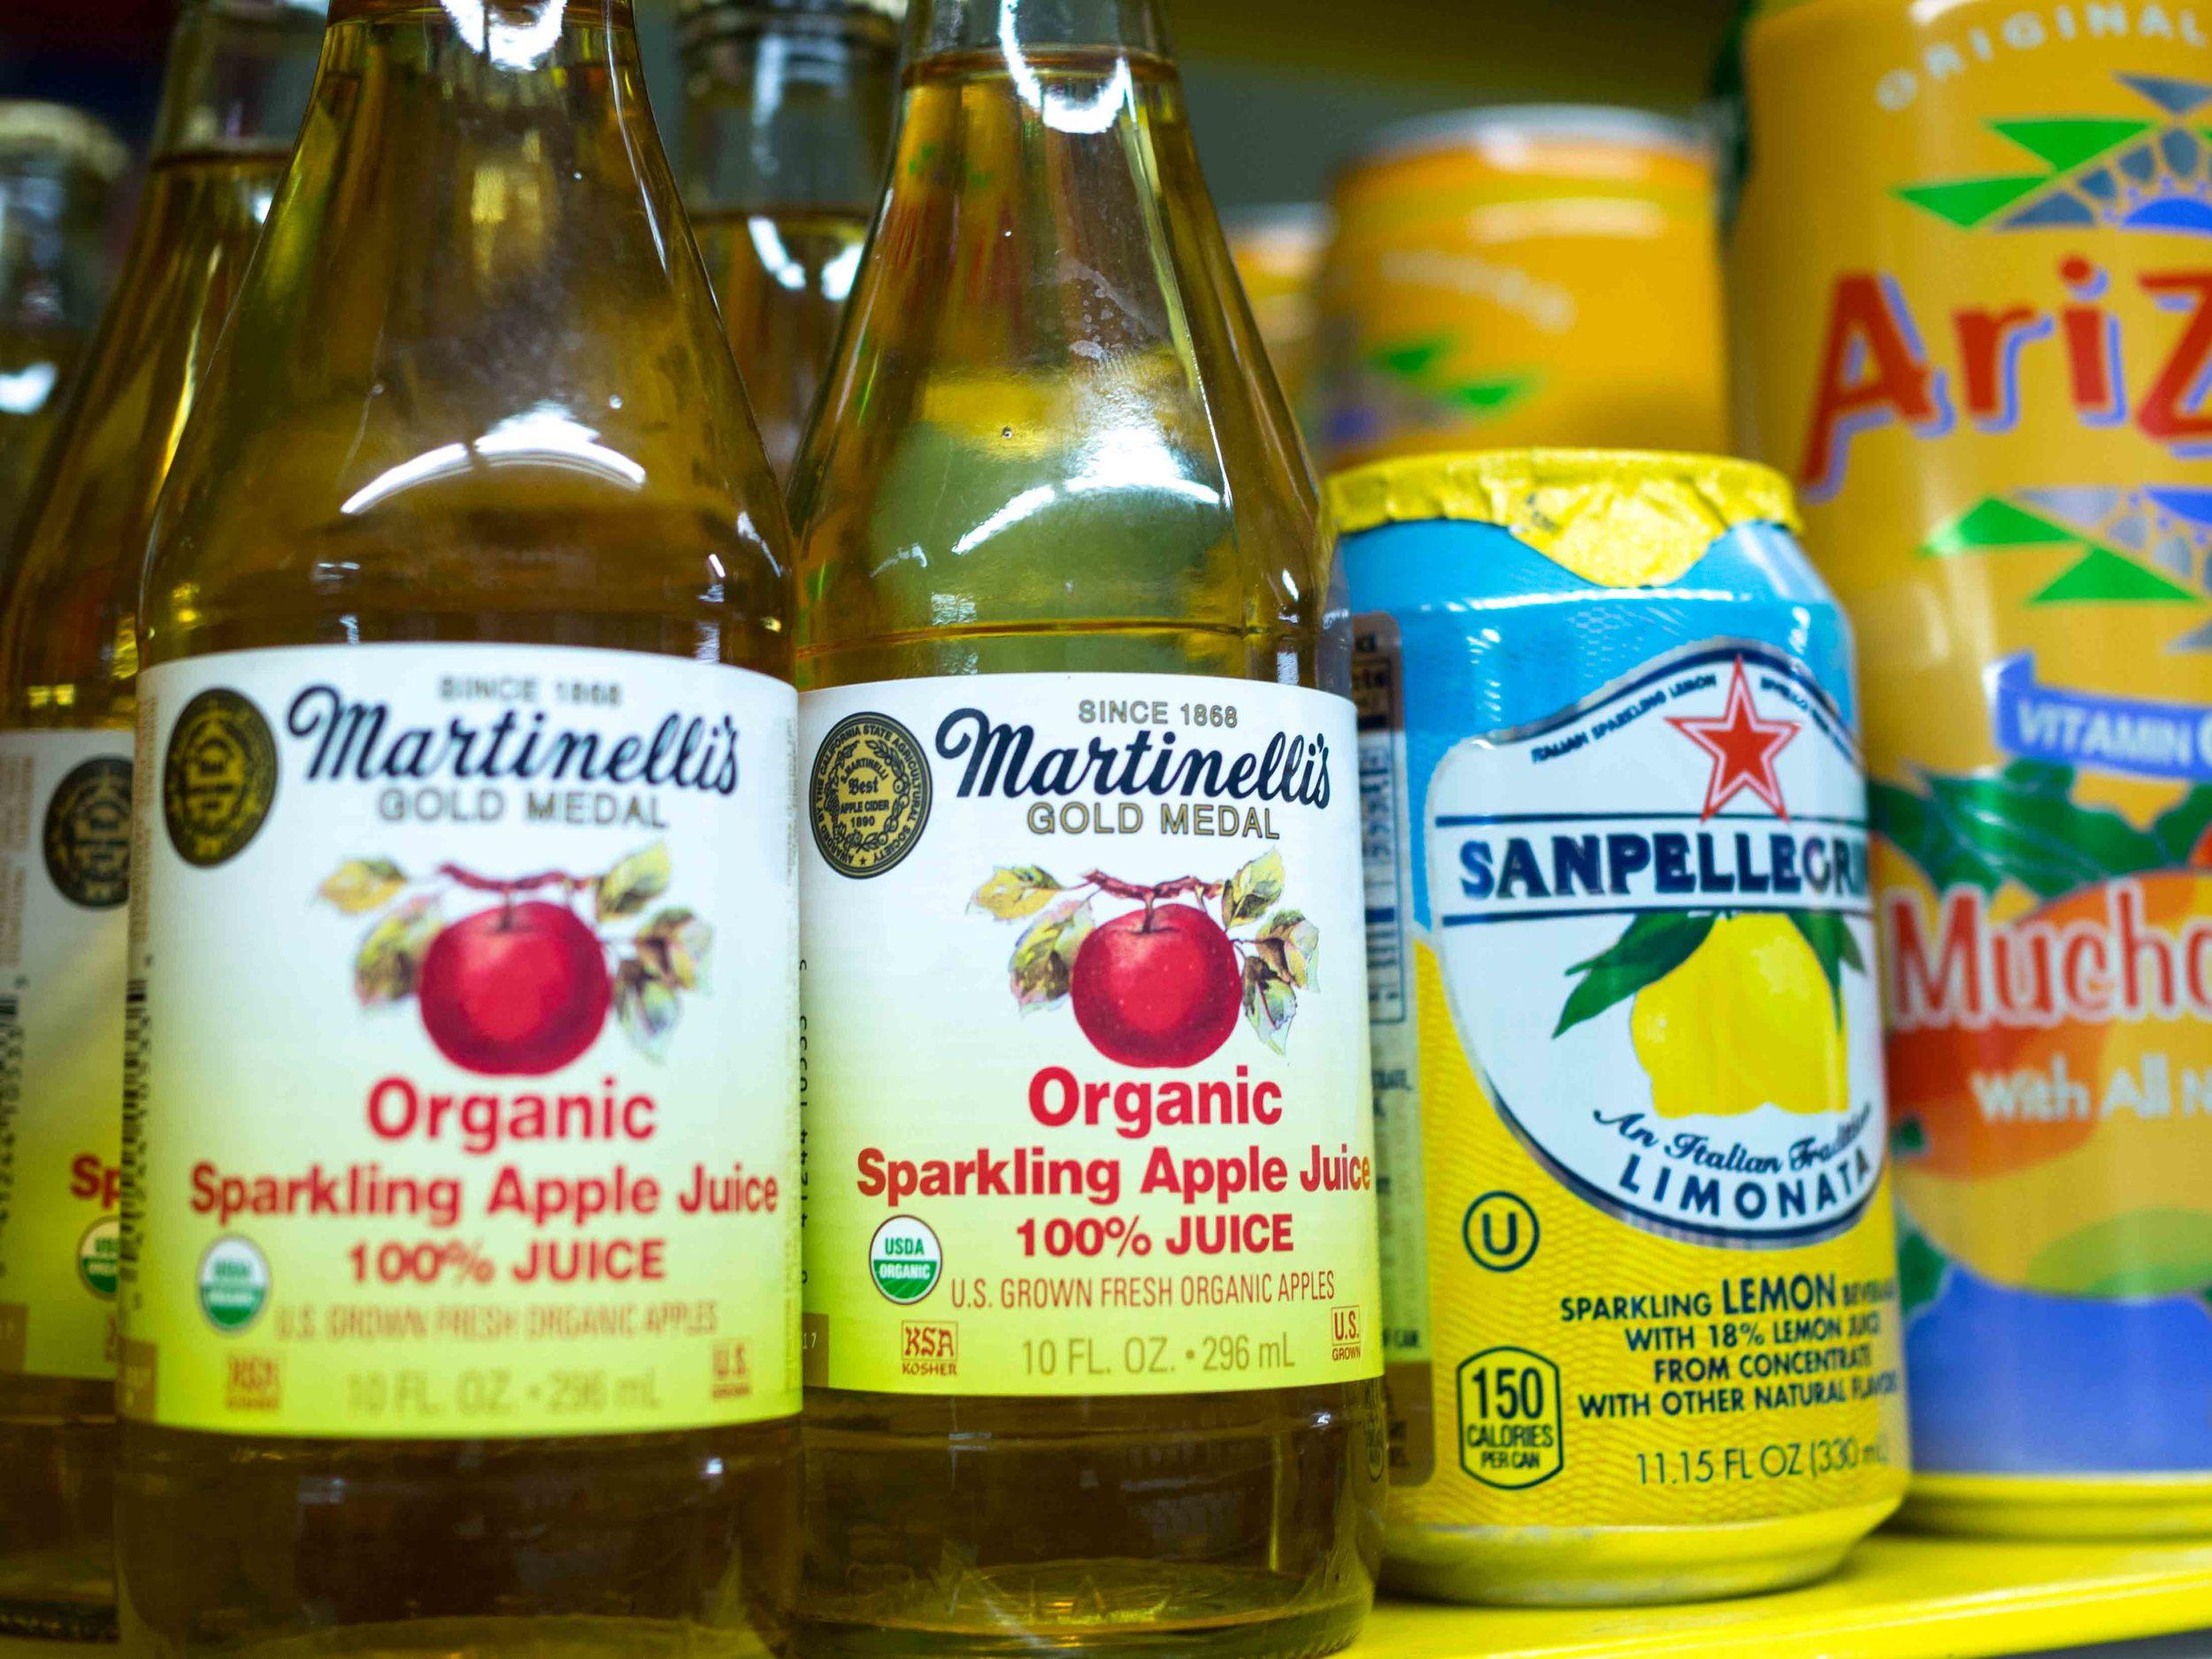 Martinelli's Organic Sparkling Apple Juice